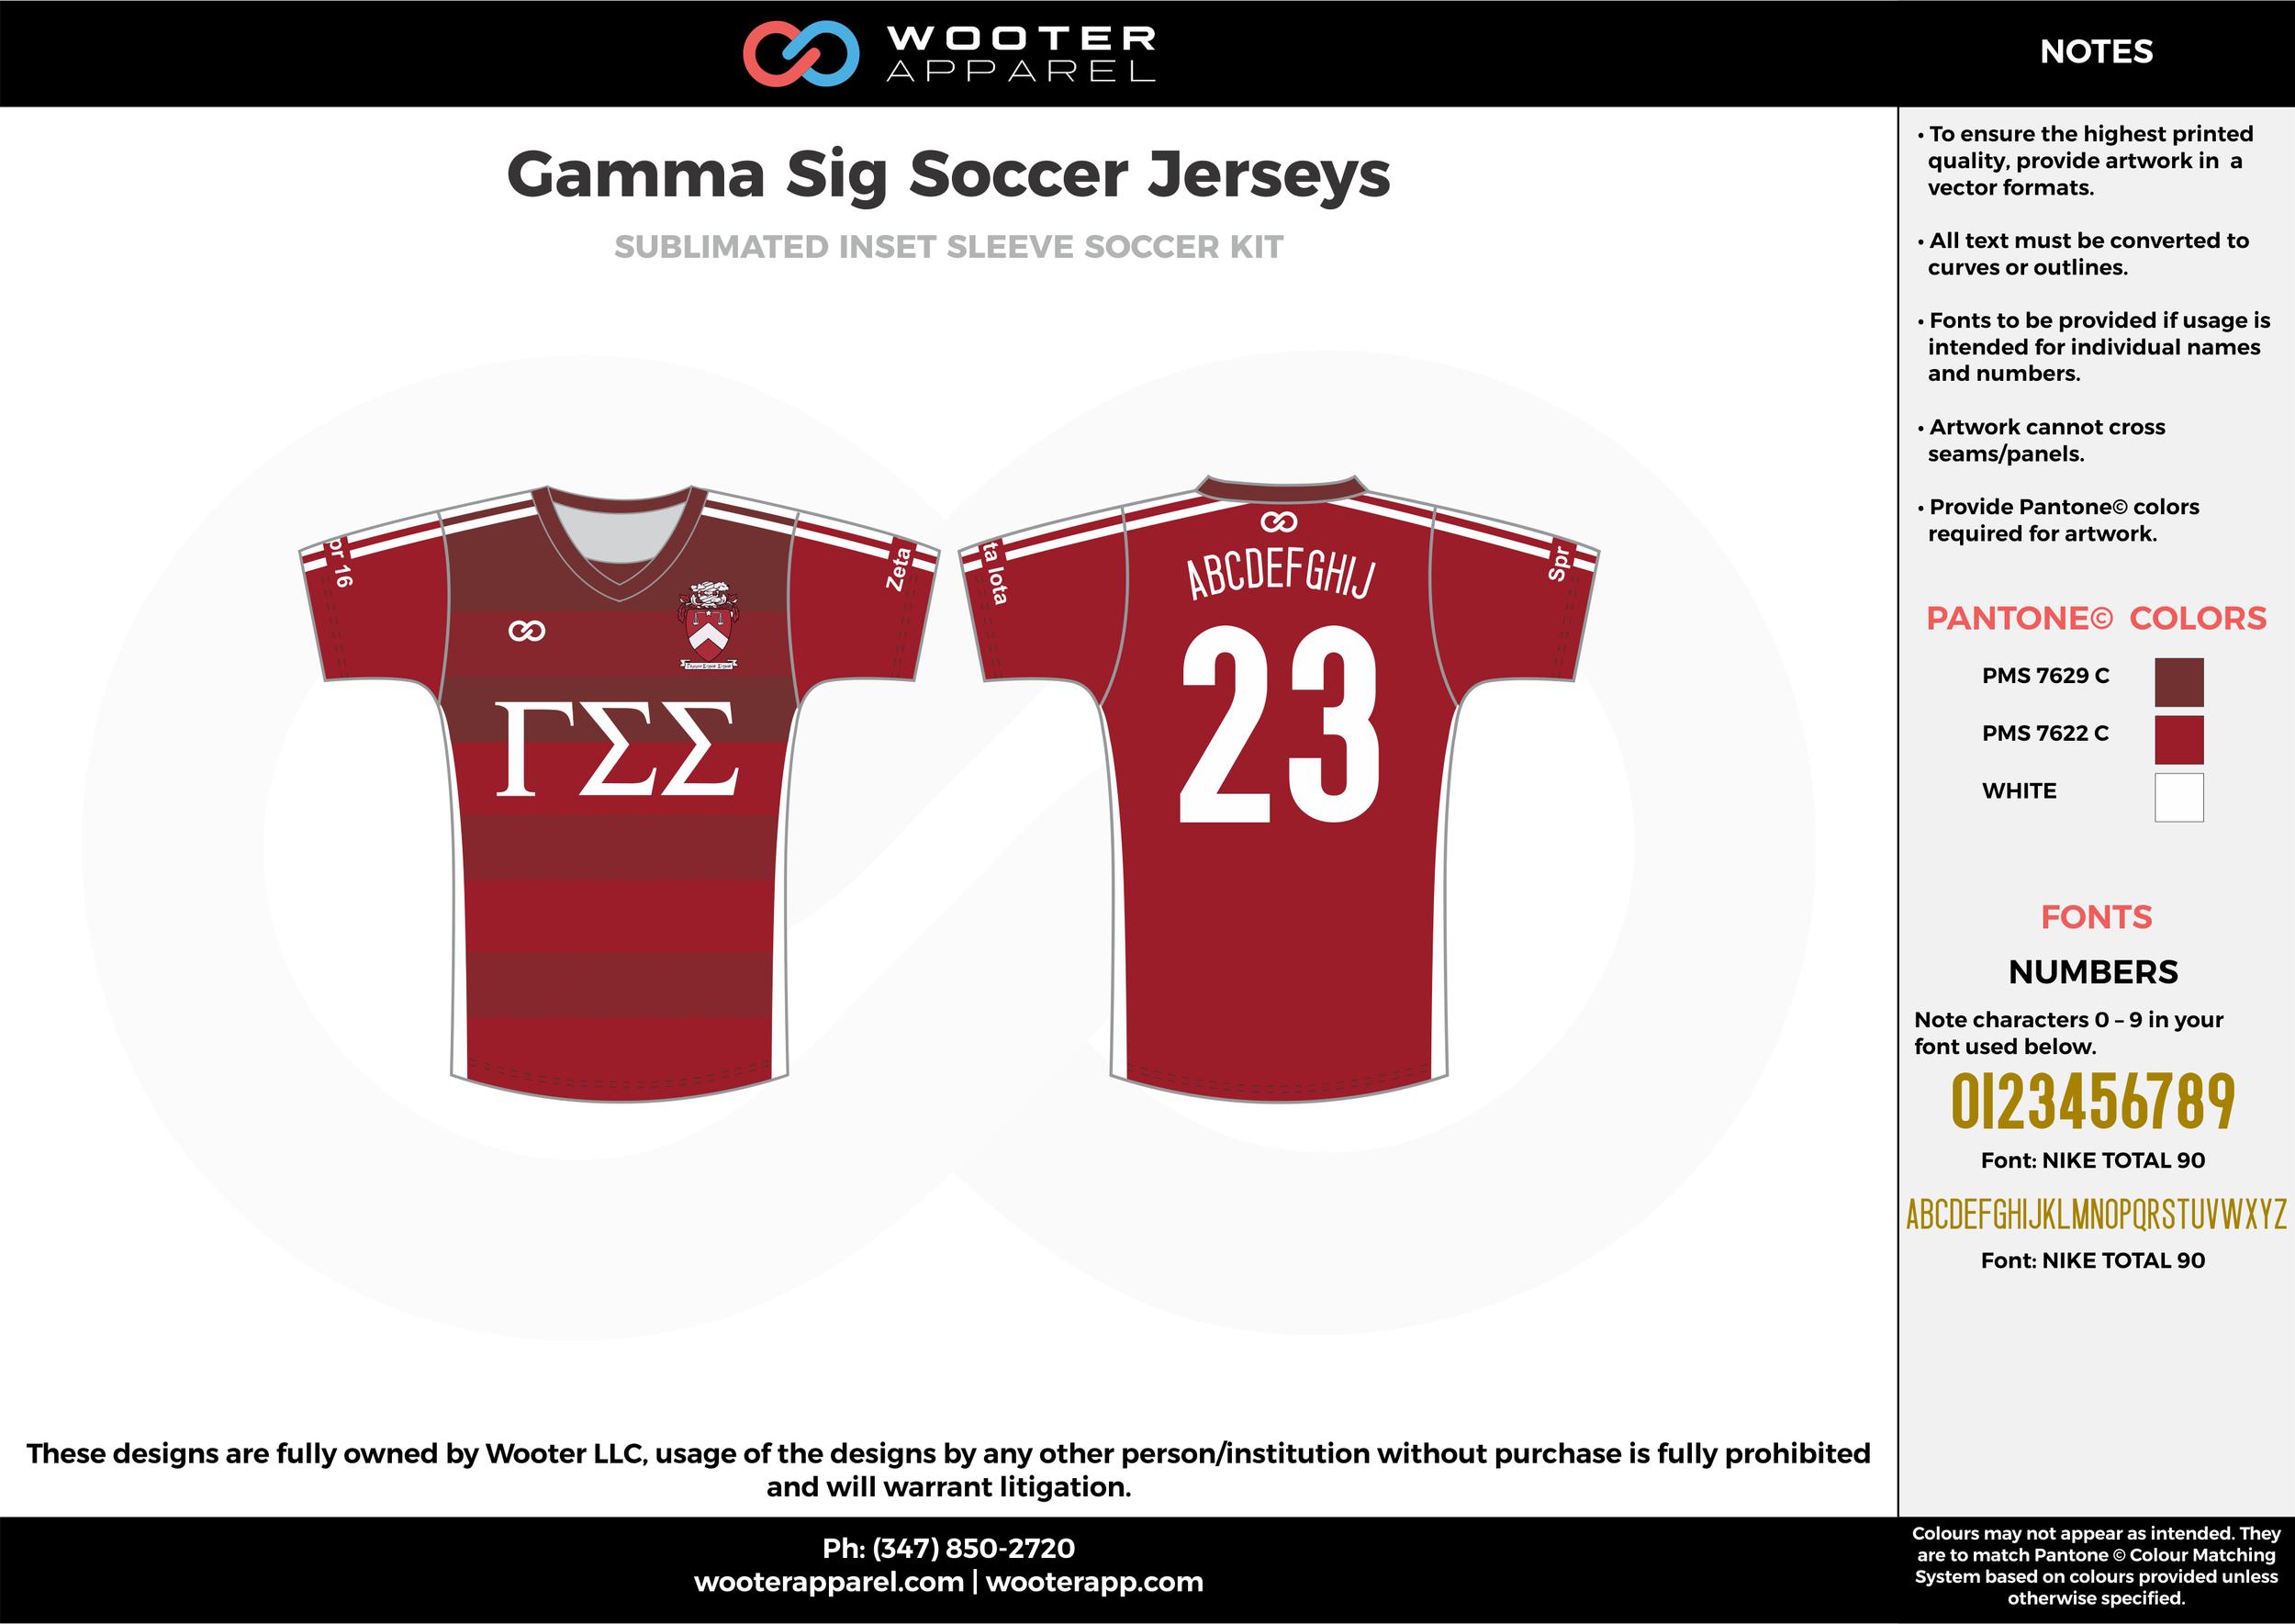 Gamma Sig maroon white custom sublimated soccer uniform jersey shirt